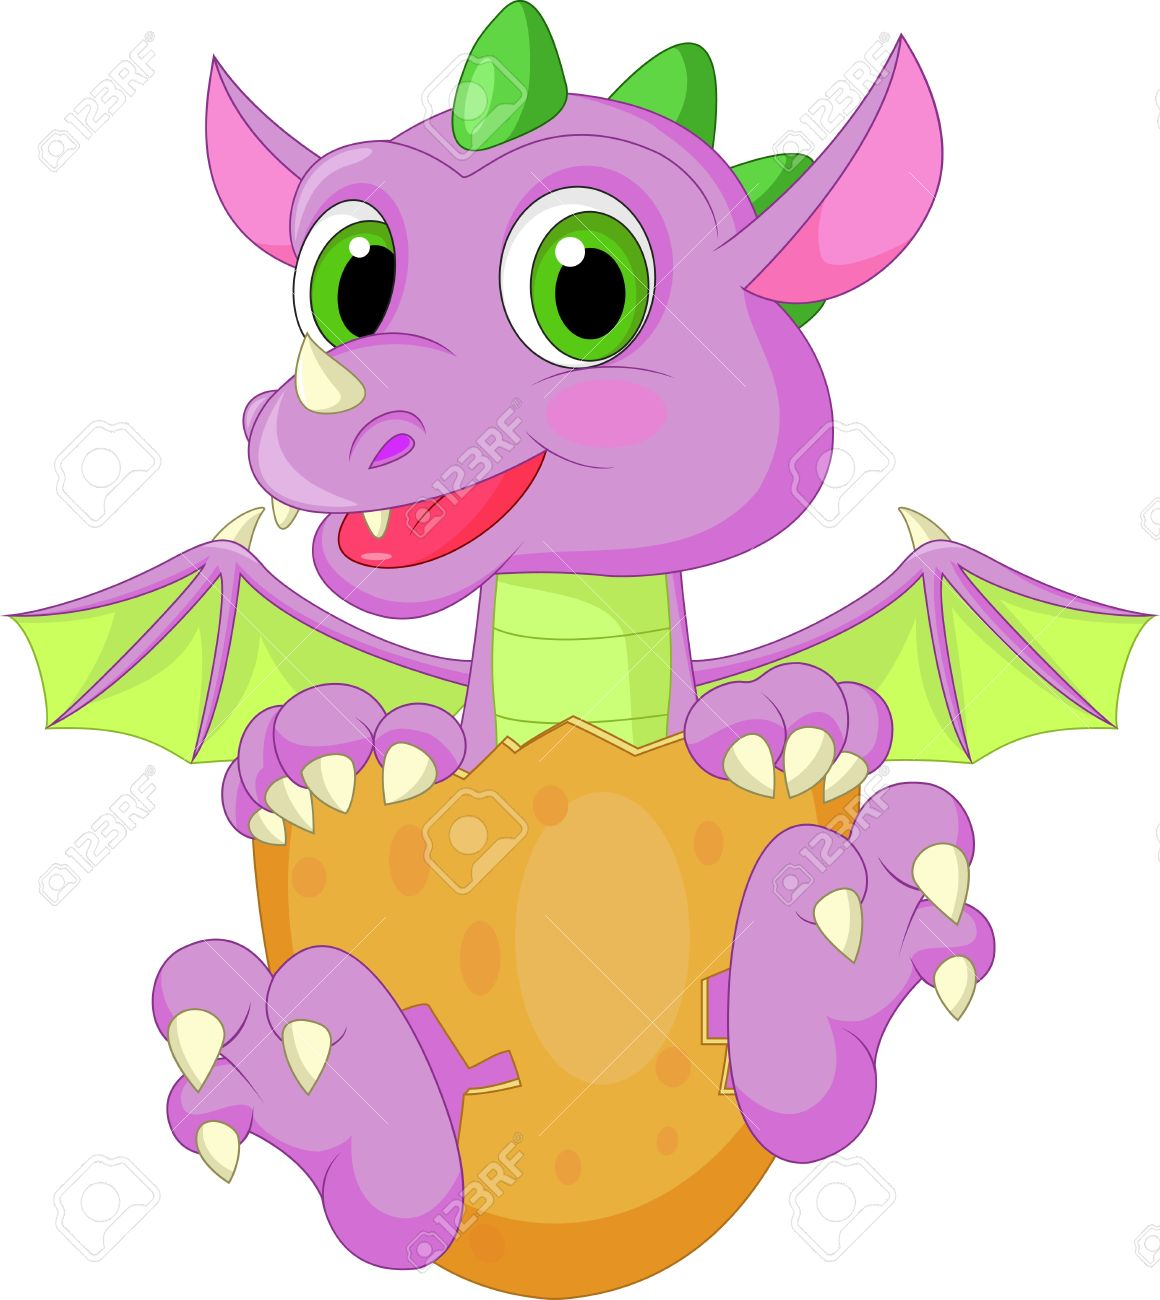 1160x1300 Baby Dinosaur Cartoon Hatching Royalty Free Cliparts, Vectors,